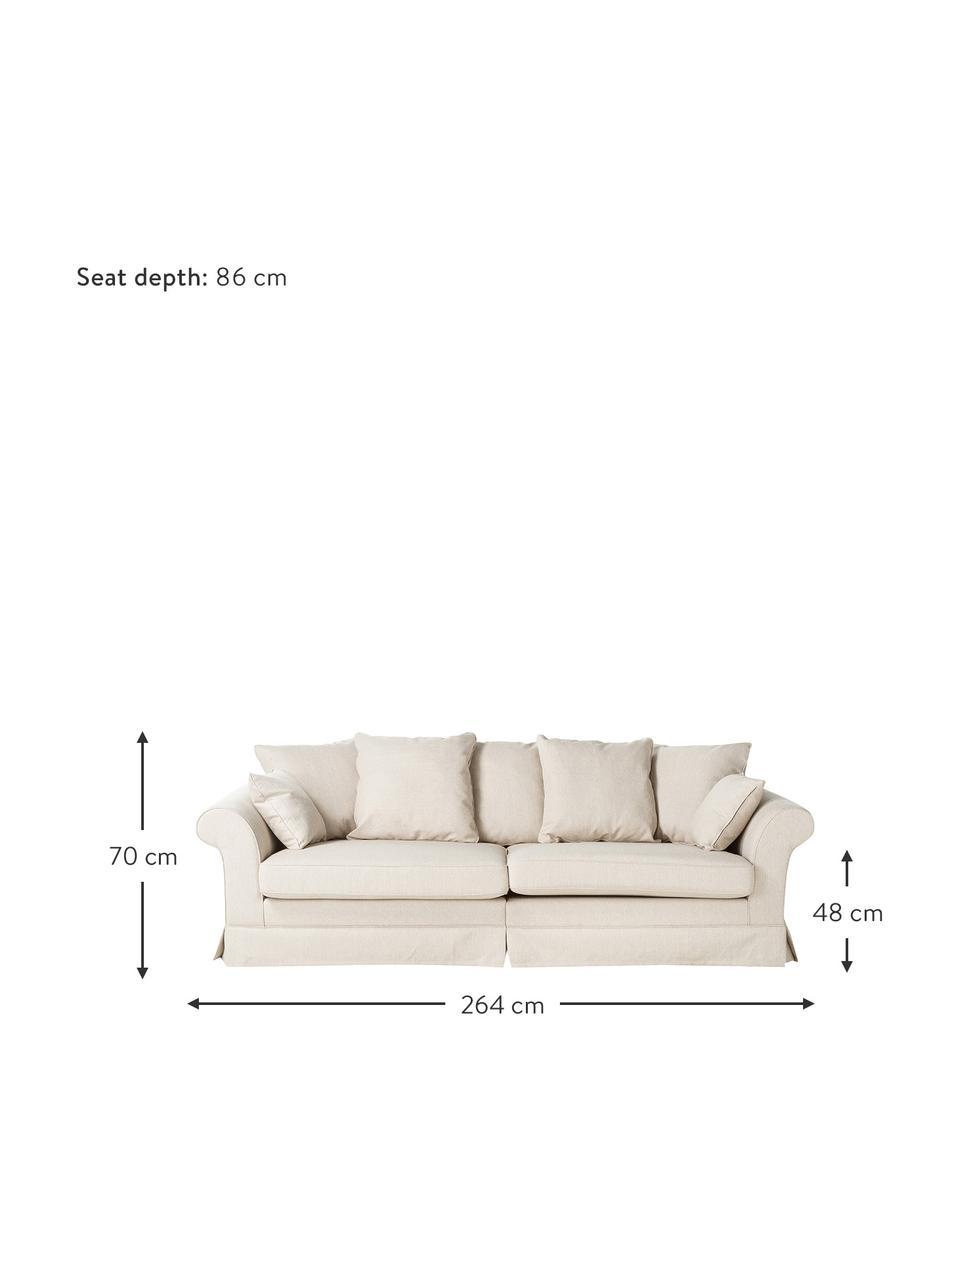 Hussen-Sofa Nobis in Creme, Bezug: Polyester, Webstoff Creme, B 264 cm